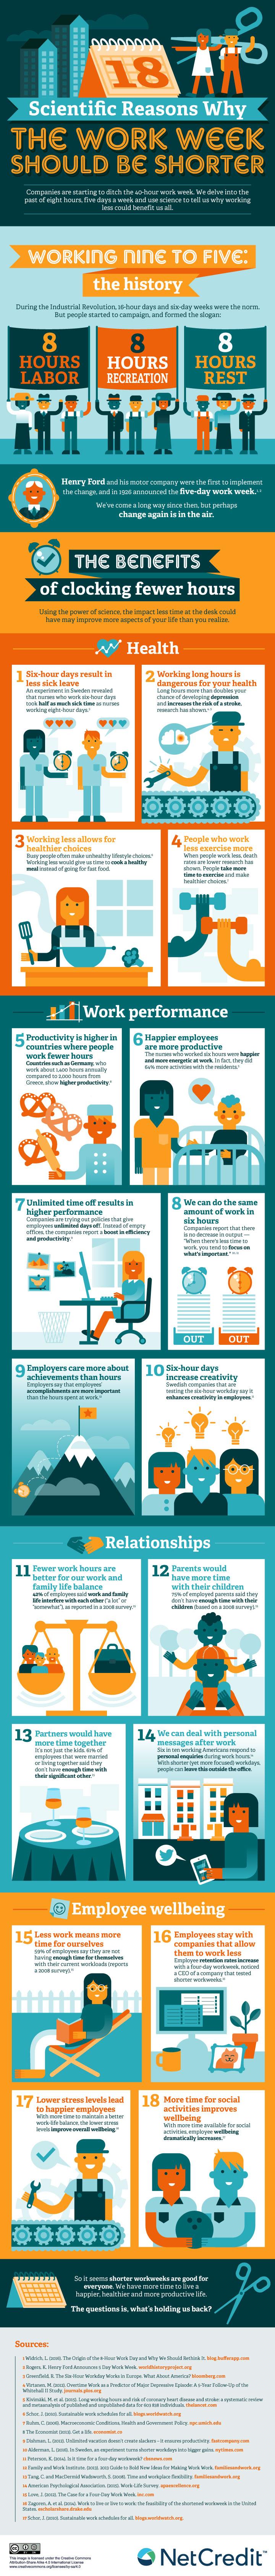 18 Scientific Reasons the Workweek Should Be Shorter